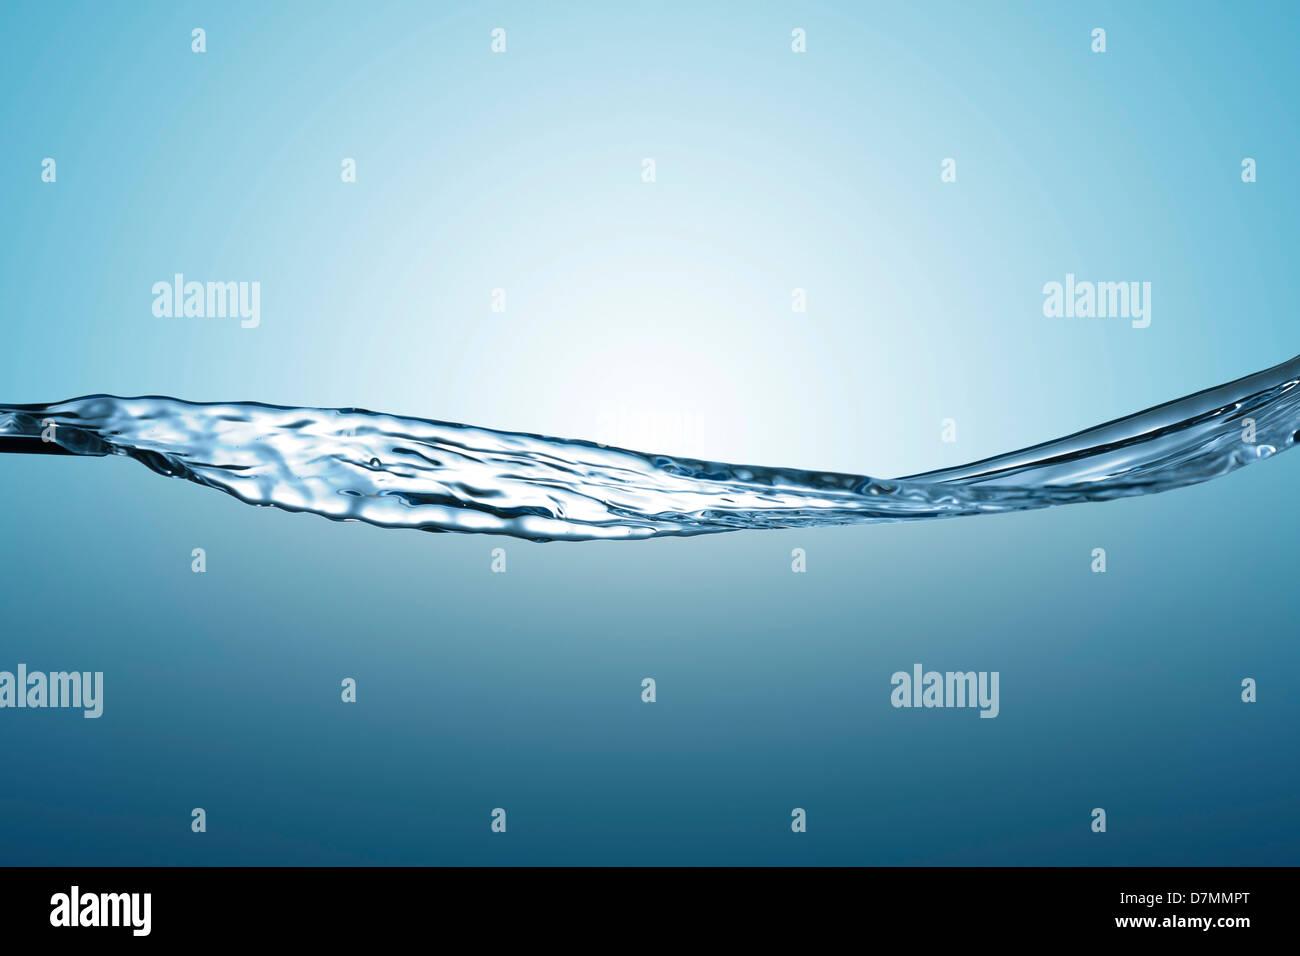 Wave - Stock Image